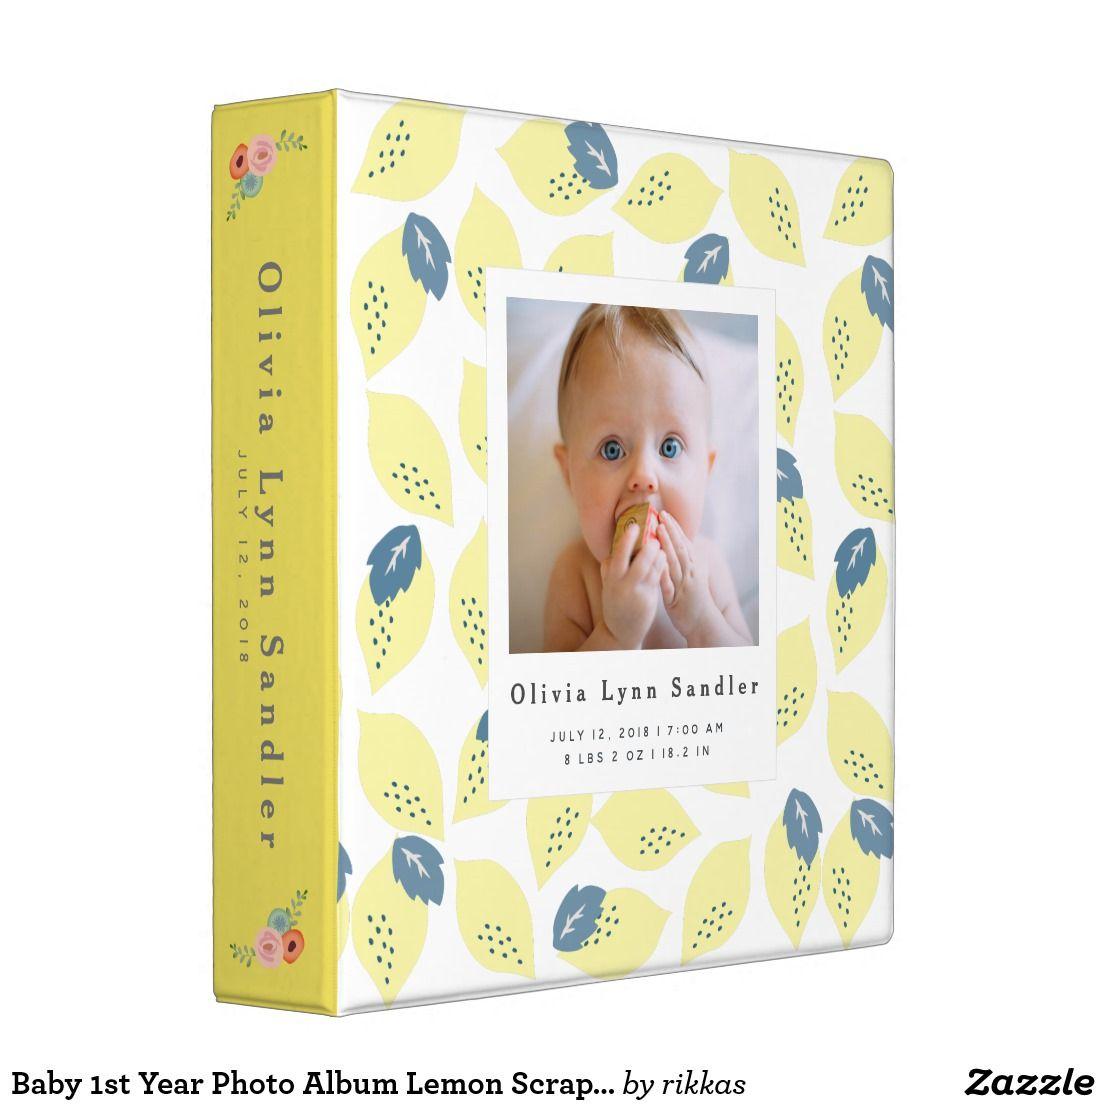 Baby 1st Year Photo Album Lemon Scrapbook Binder